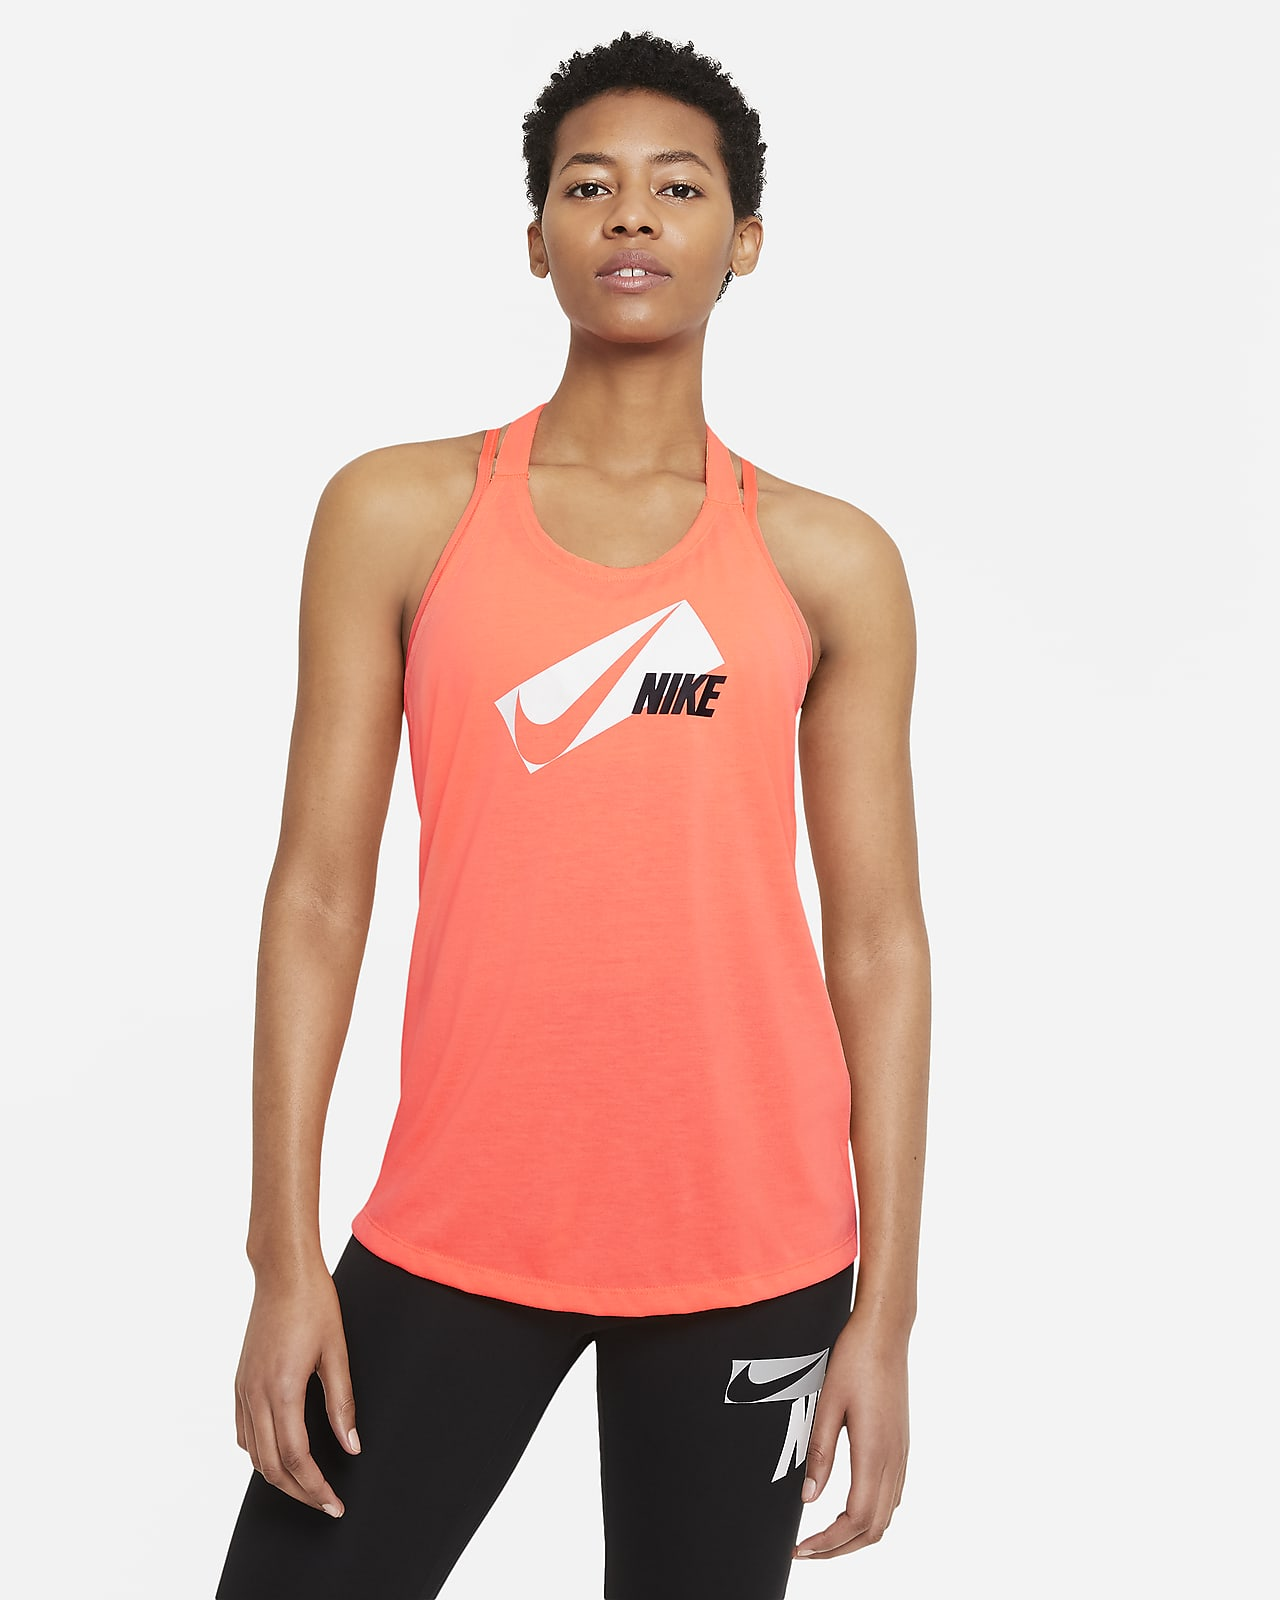 Nike Dri-FIT Elastika Women's Graphic Training Tank